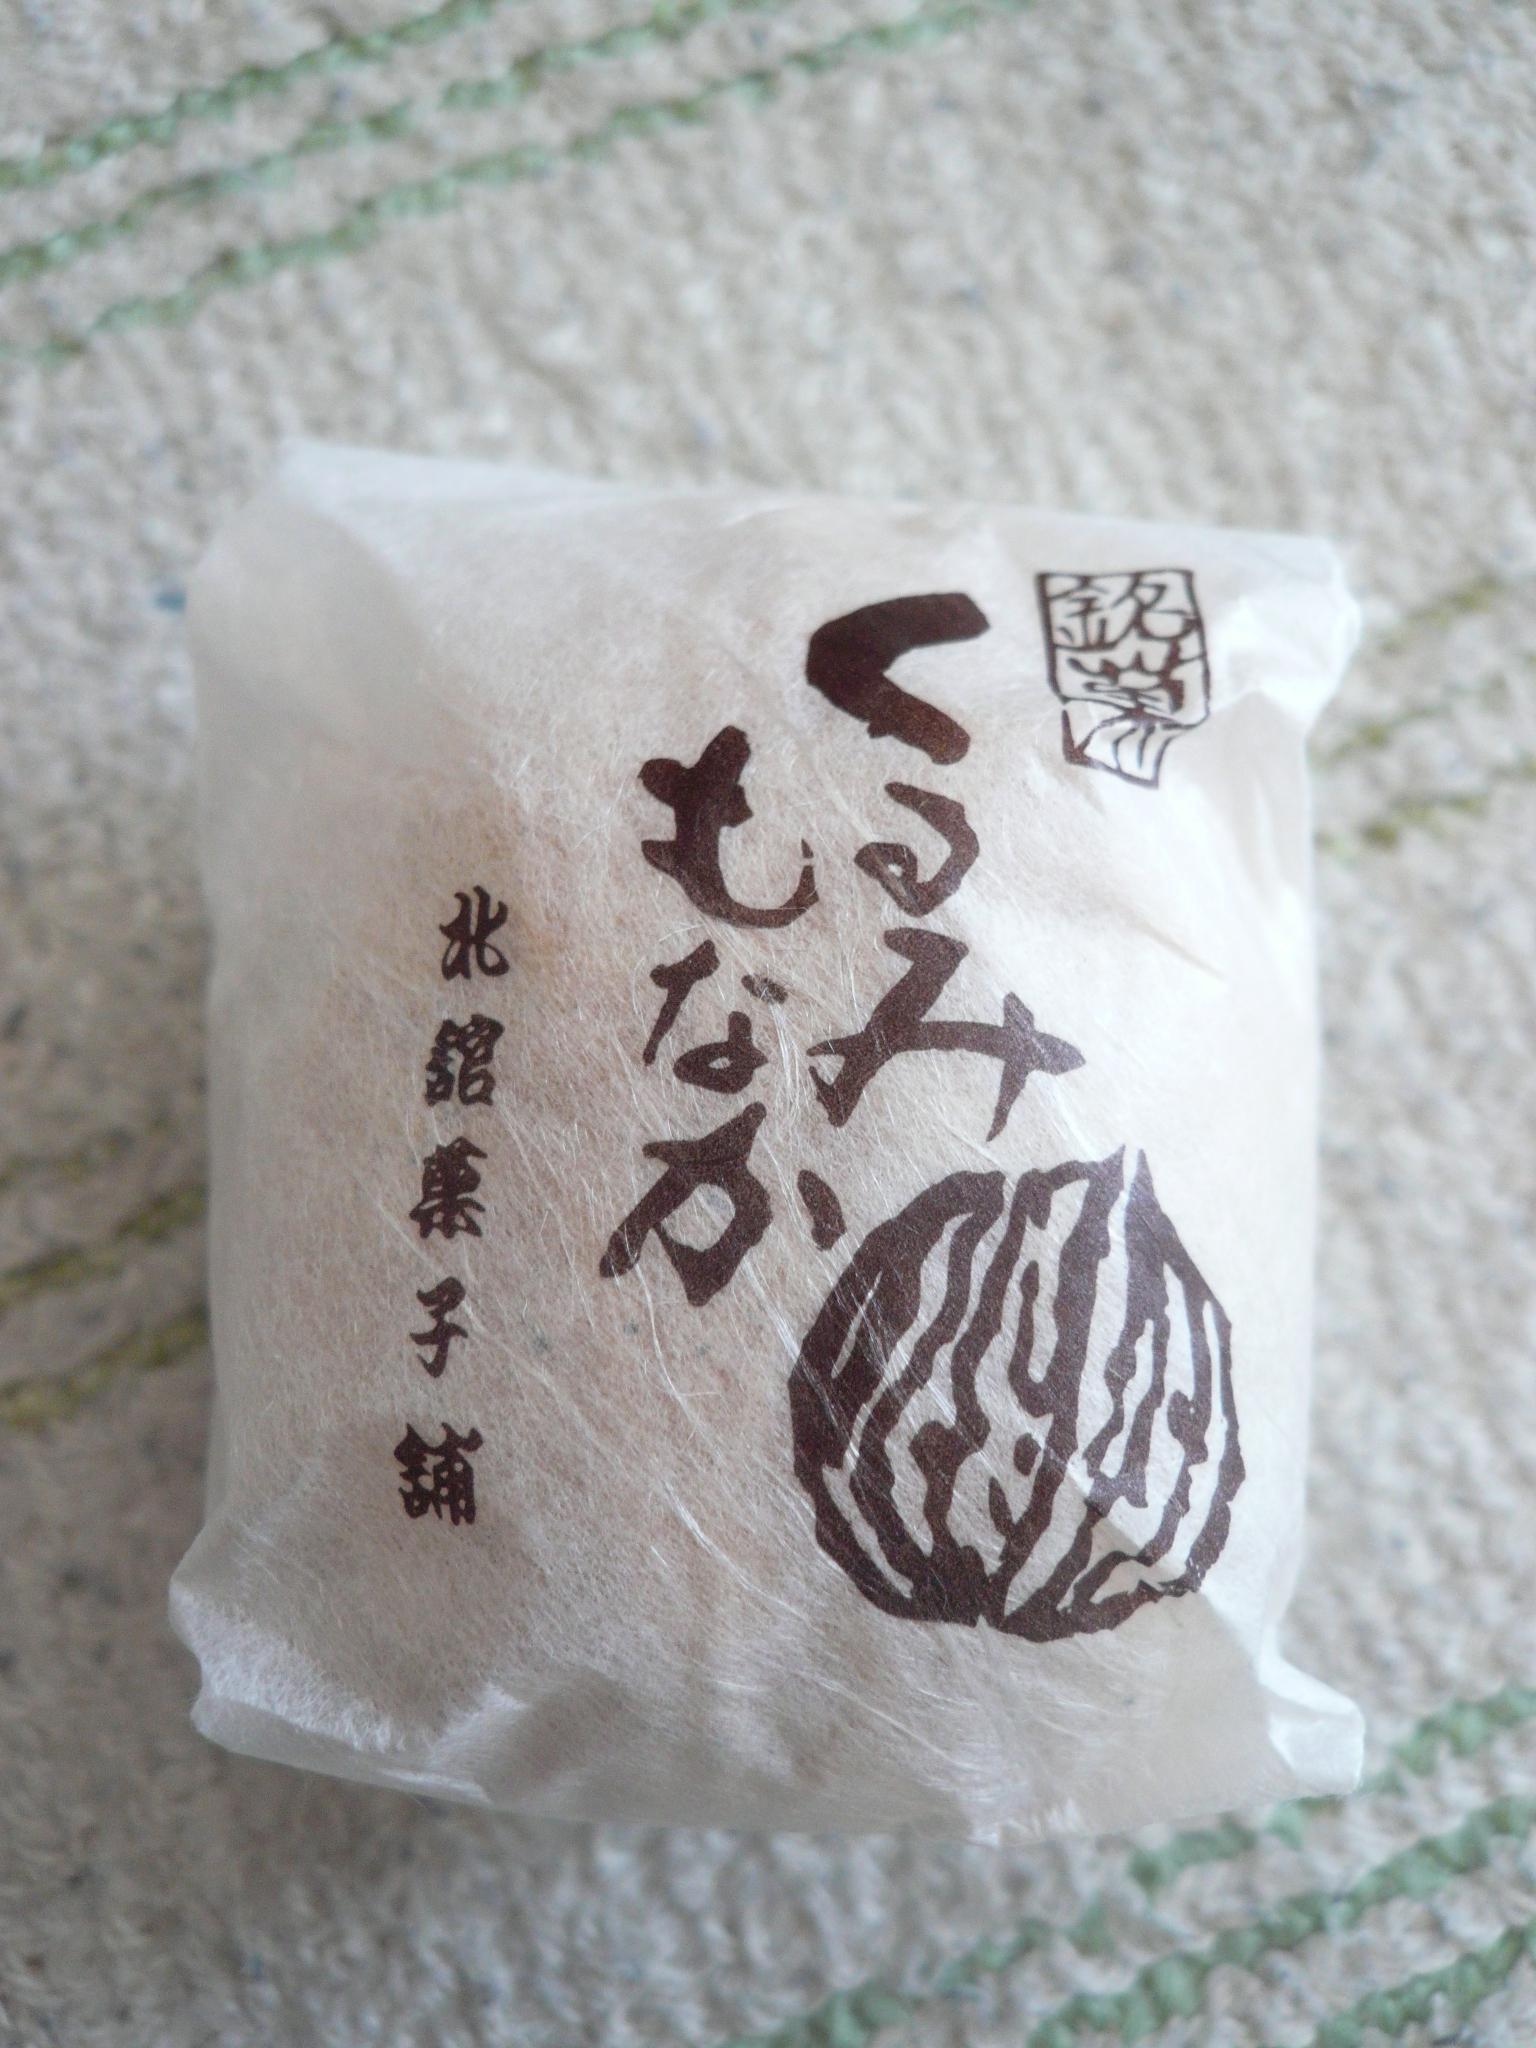 北館菓子舗